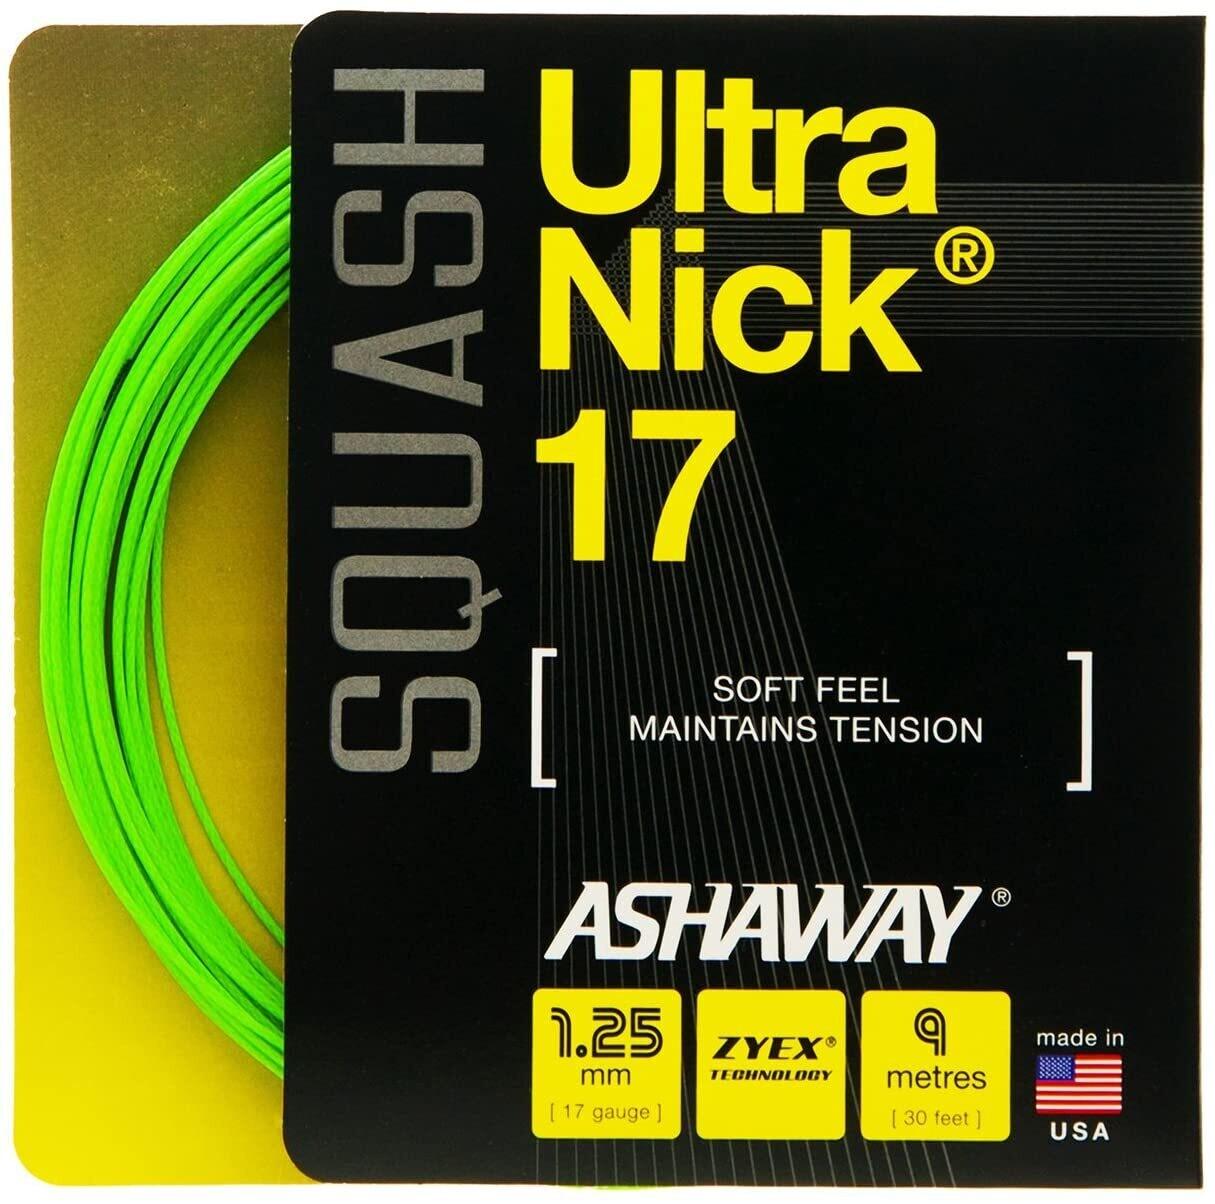 Cuerdas de squash Ashaway Ultra Nick 18